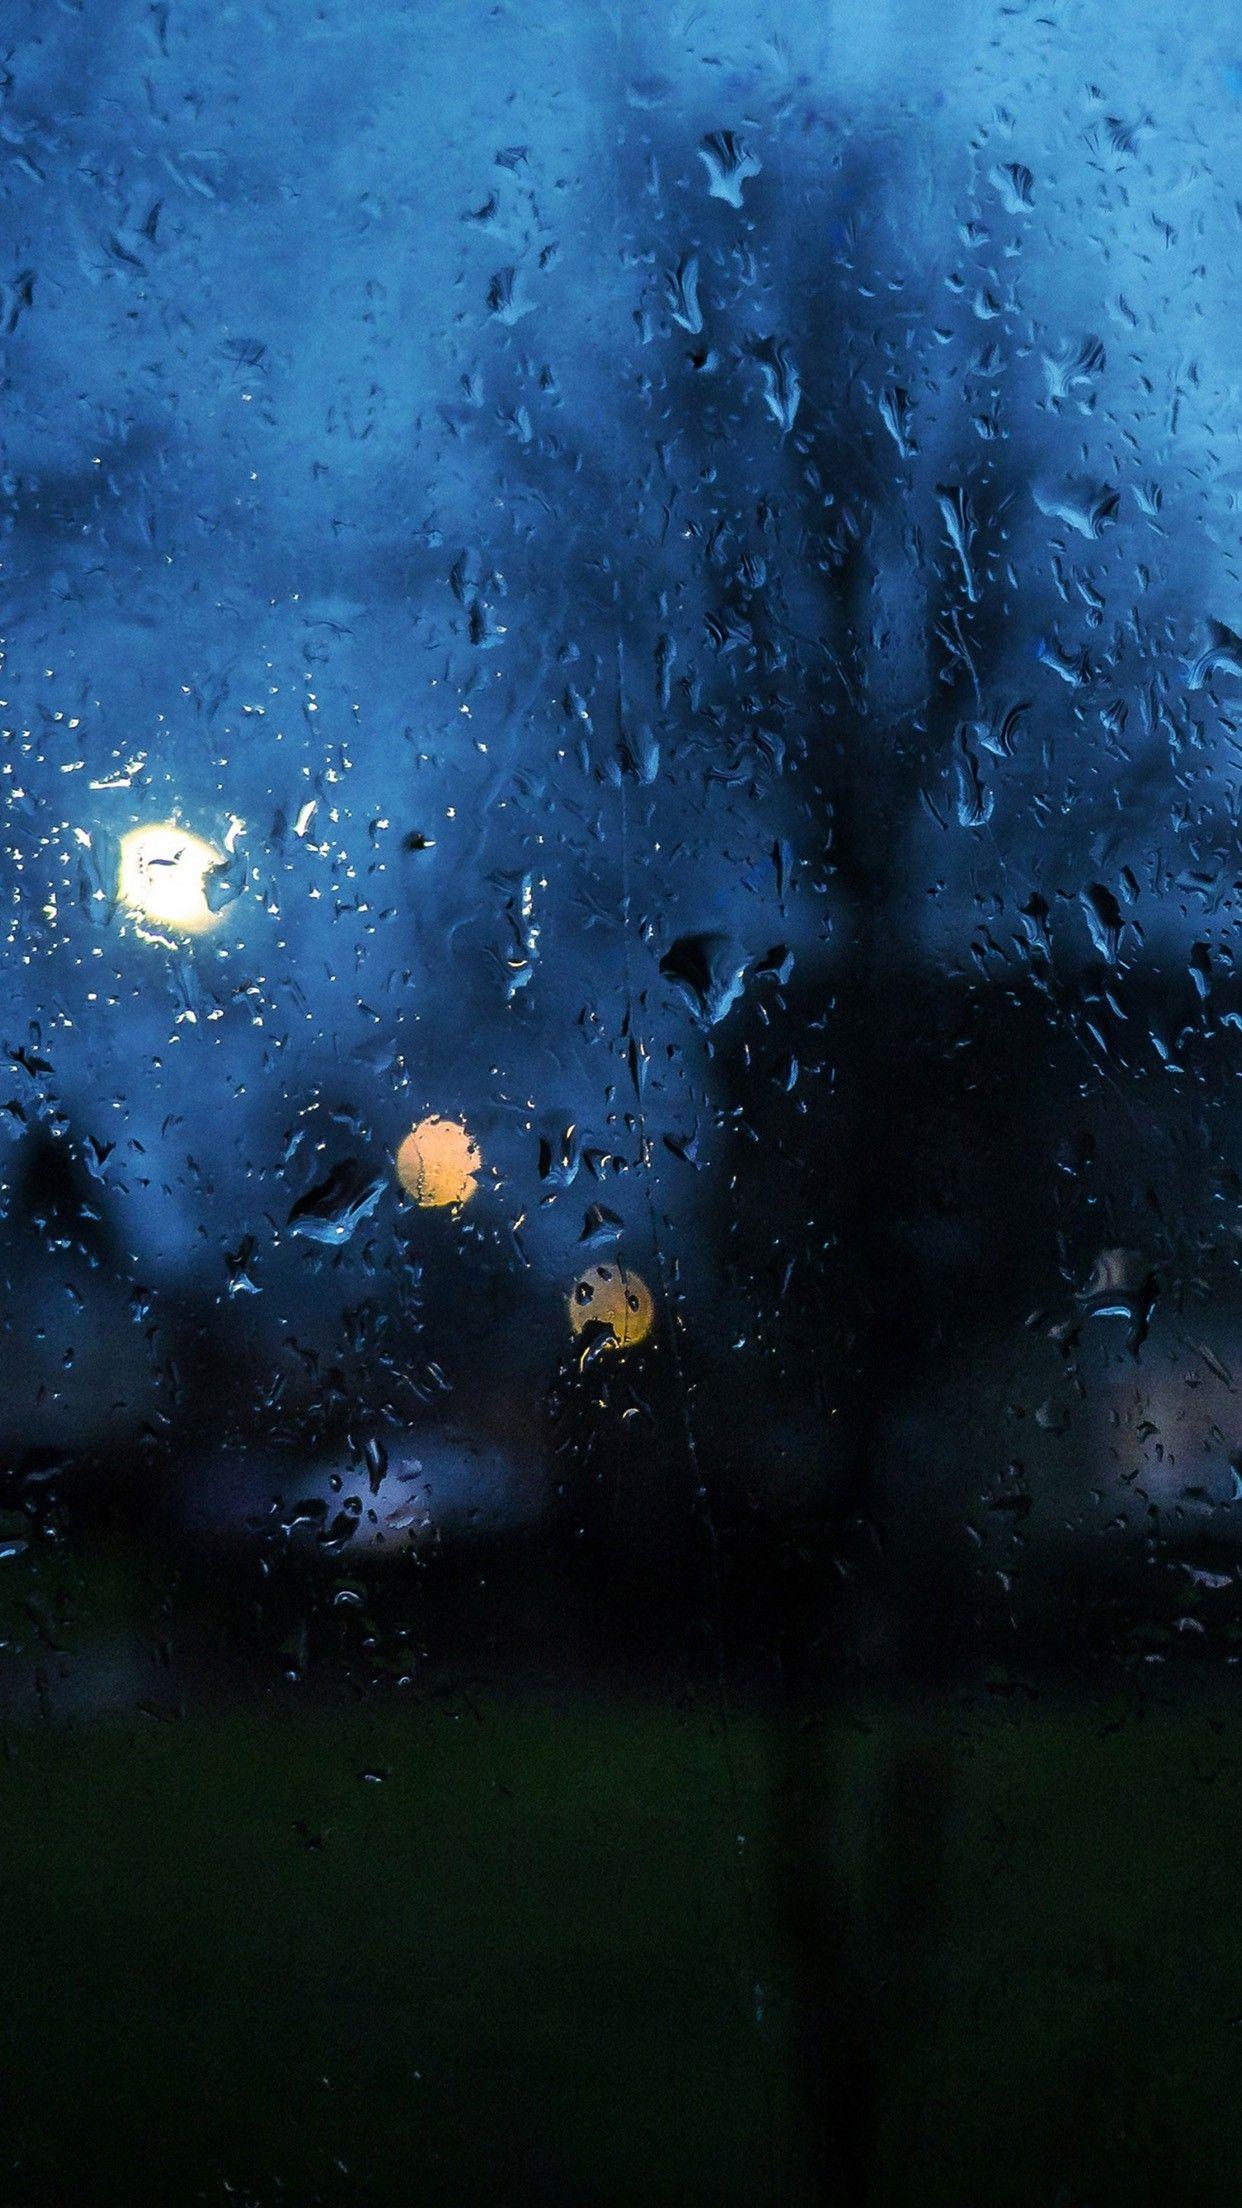 Rainy Day Window Bokeh Smartphone Wallpaper and Lockscreen